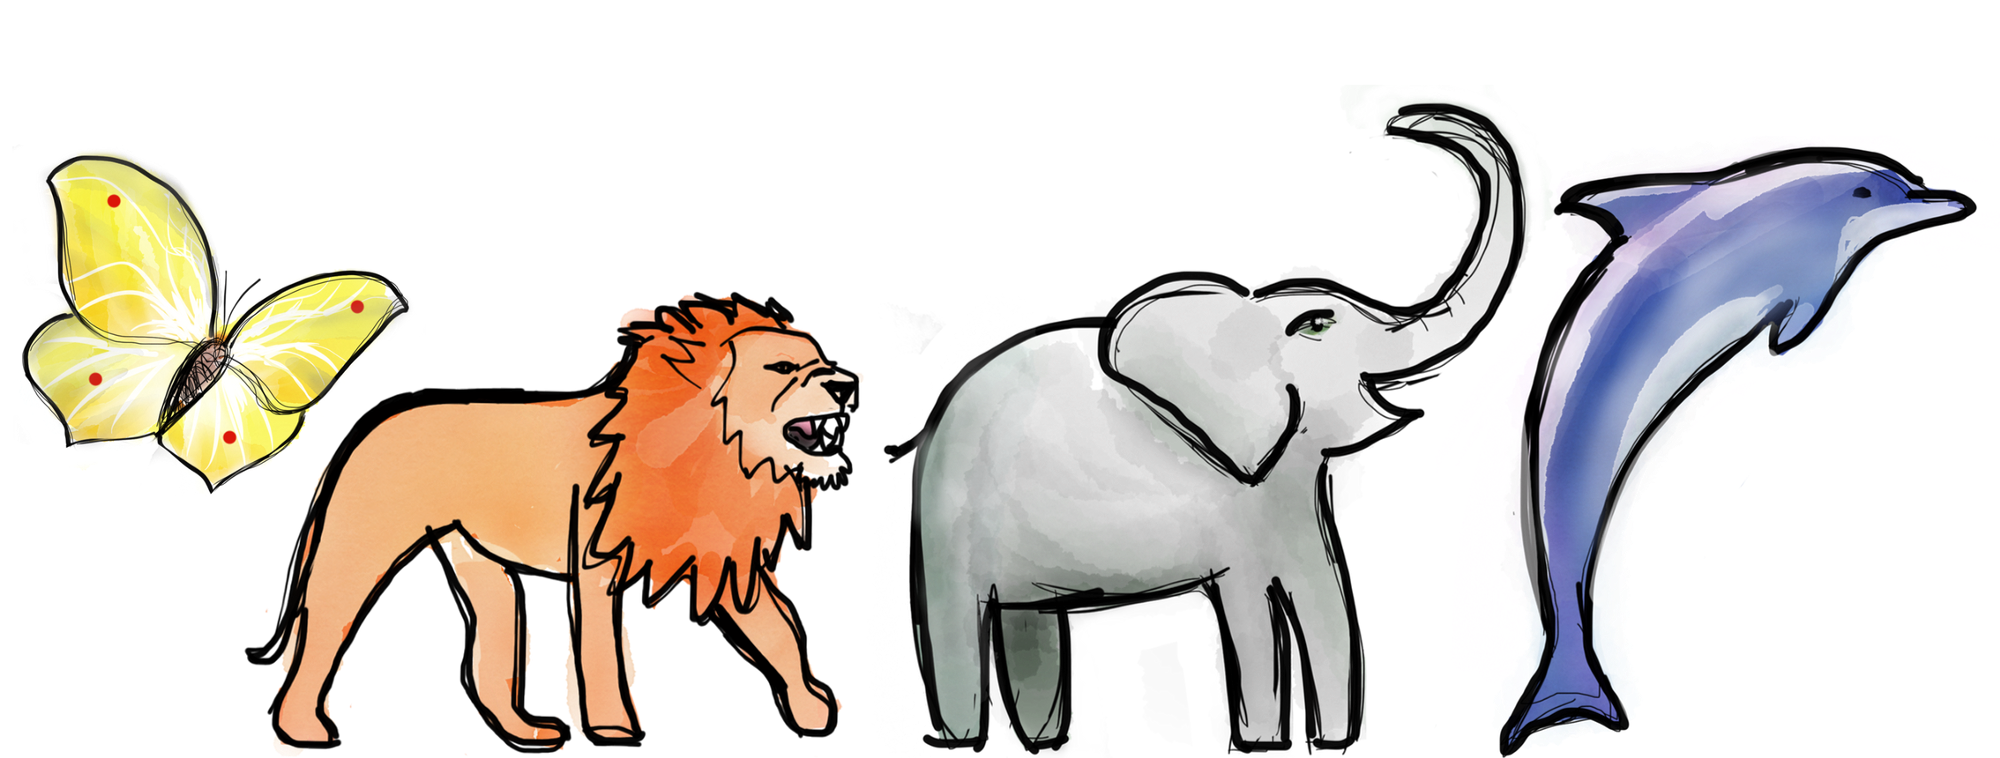 Motivation clipart dependency. Understanding group dynamics sandra